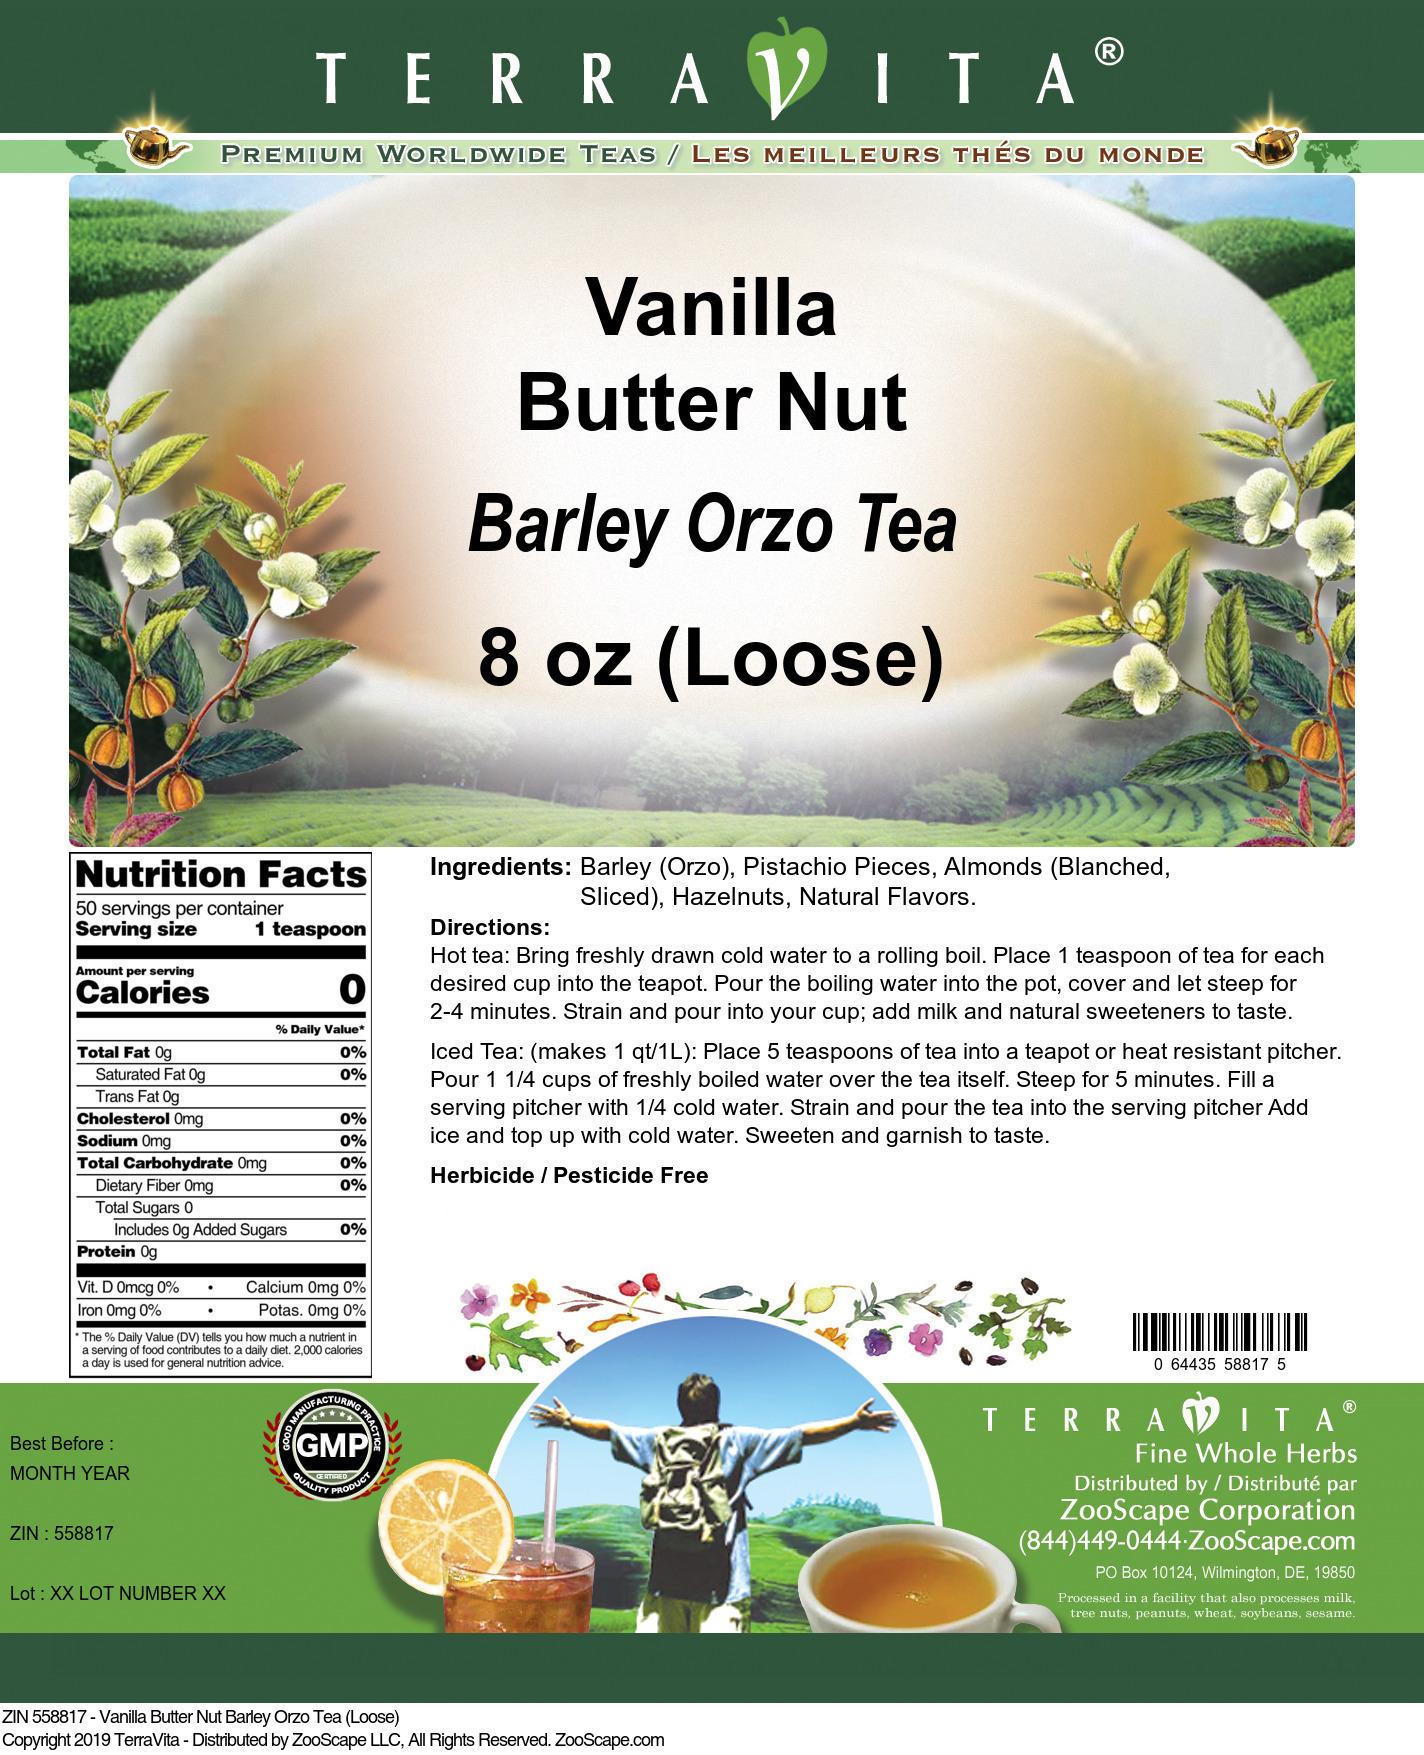 Vanilla Butter Nut Barley Orzo Tea (Loose)